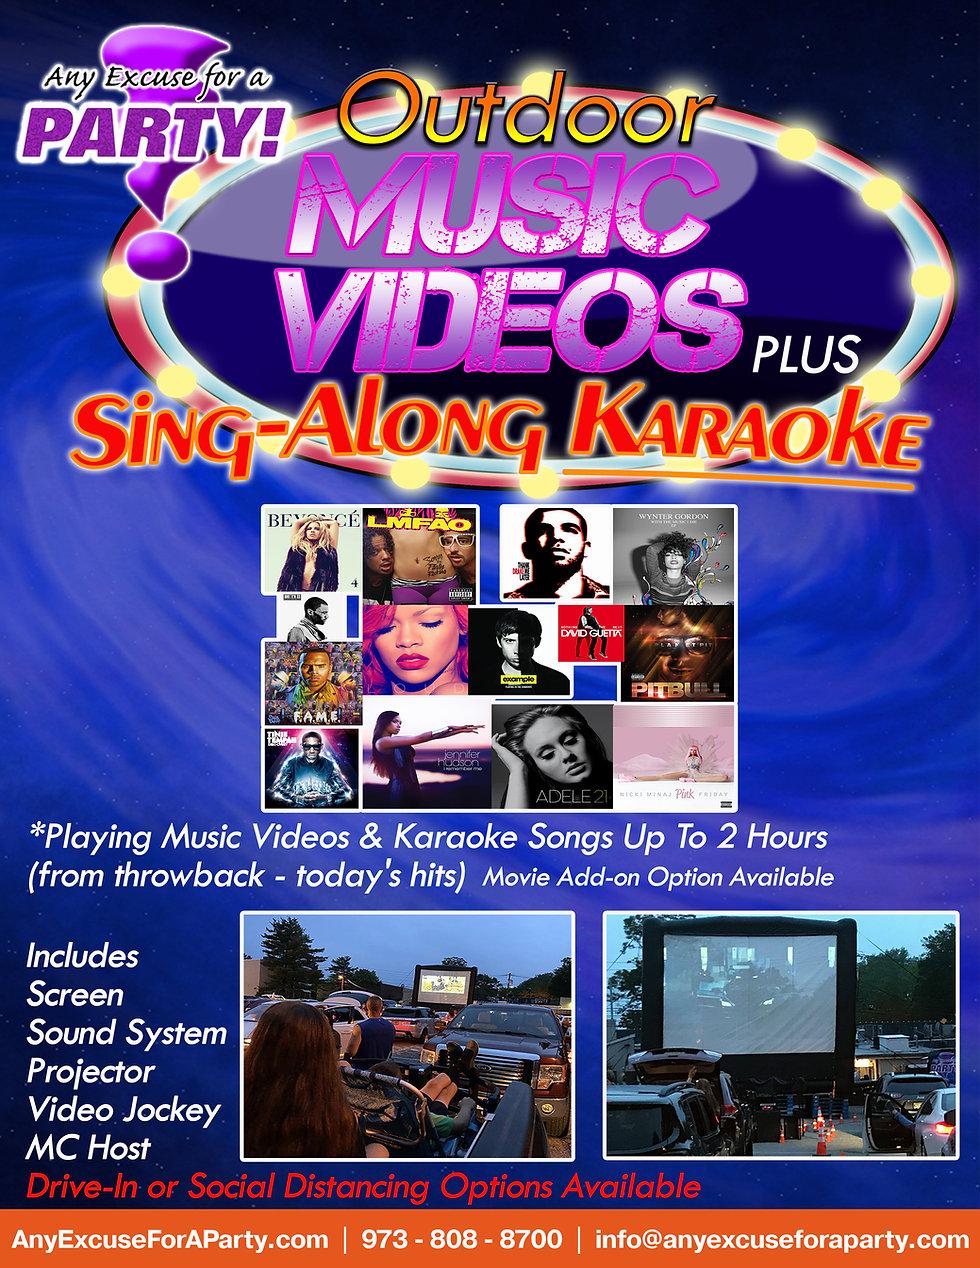 Outdoor Music Videos Plus Karaoke wo pri